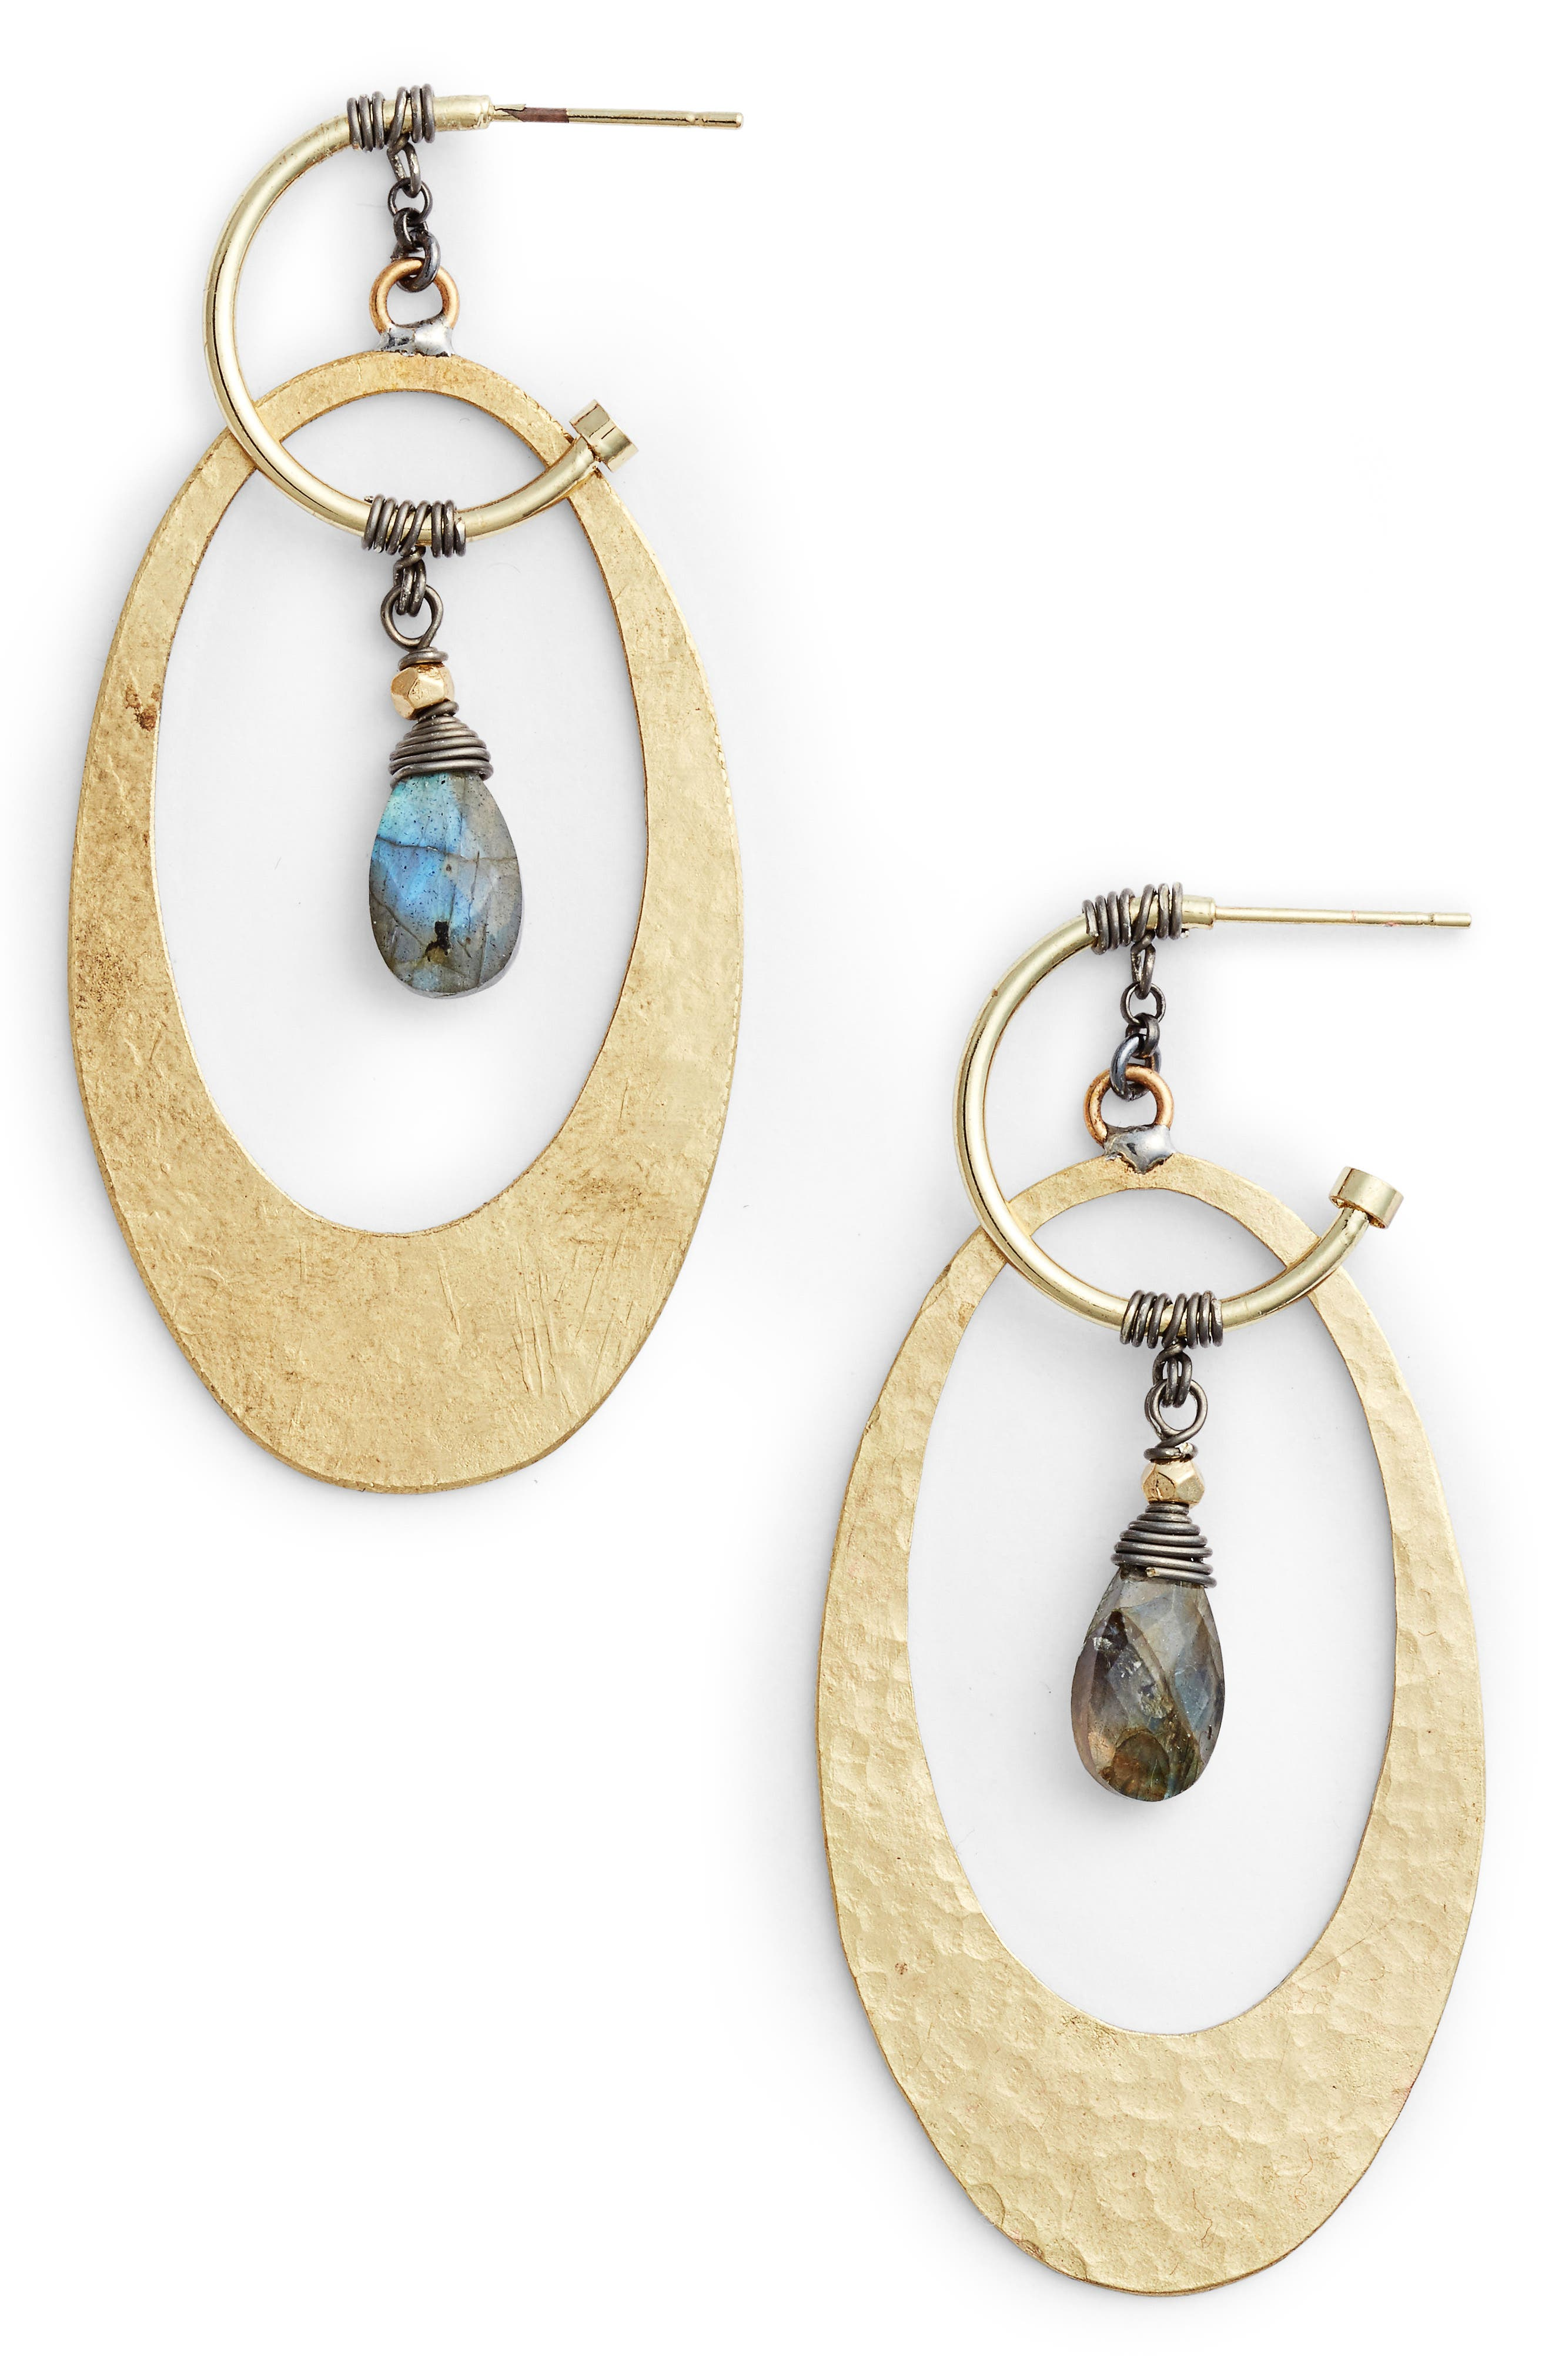 Main Image - Nakamol Design Oval Labradorite Earrings